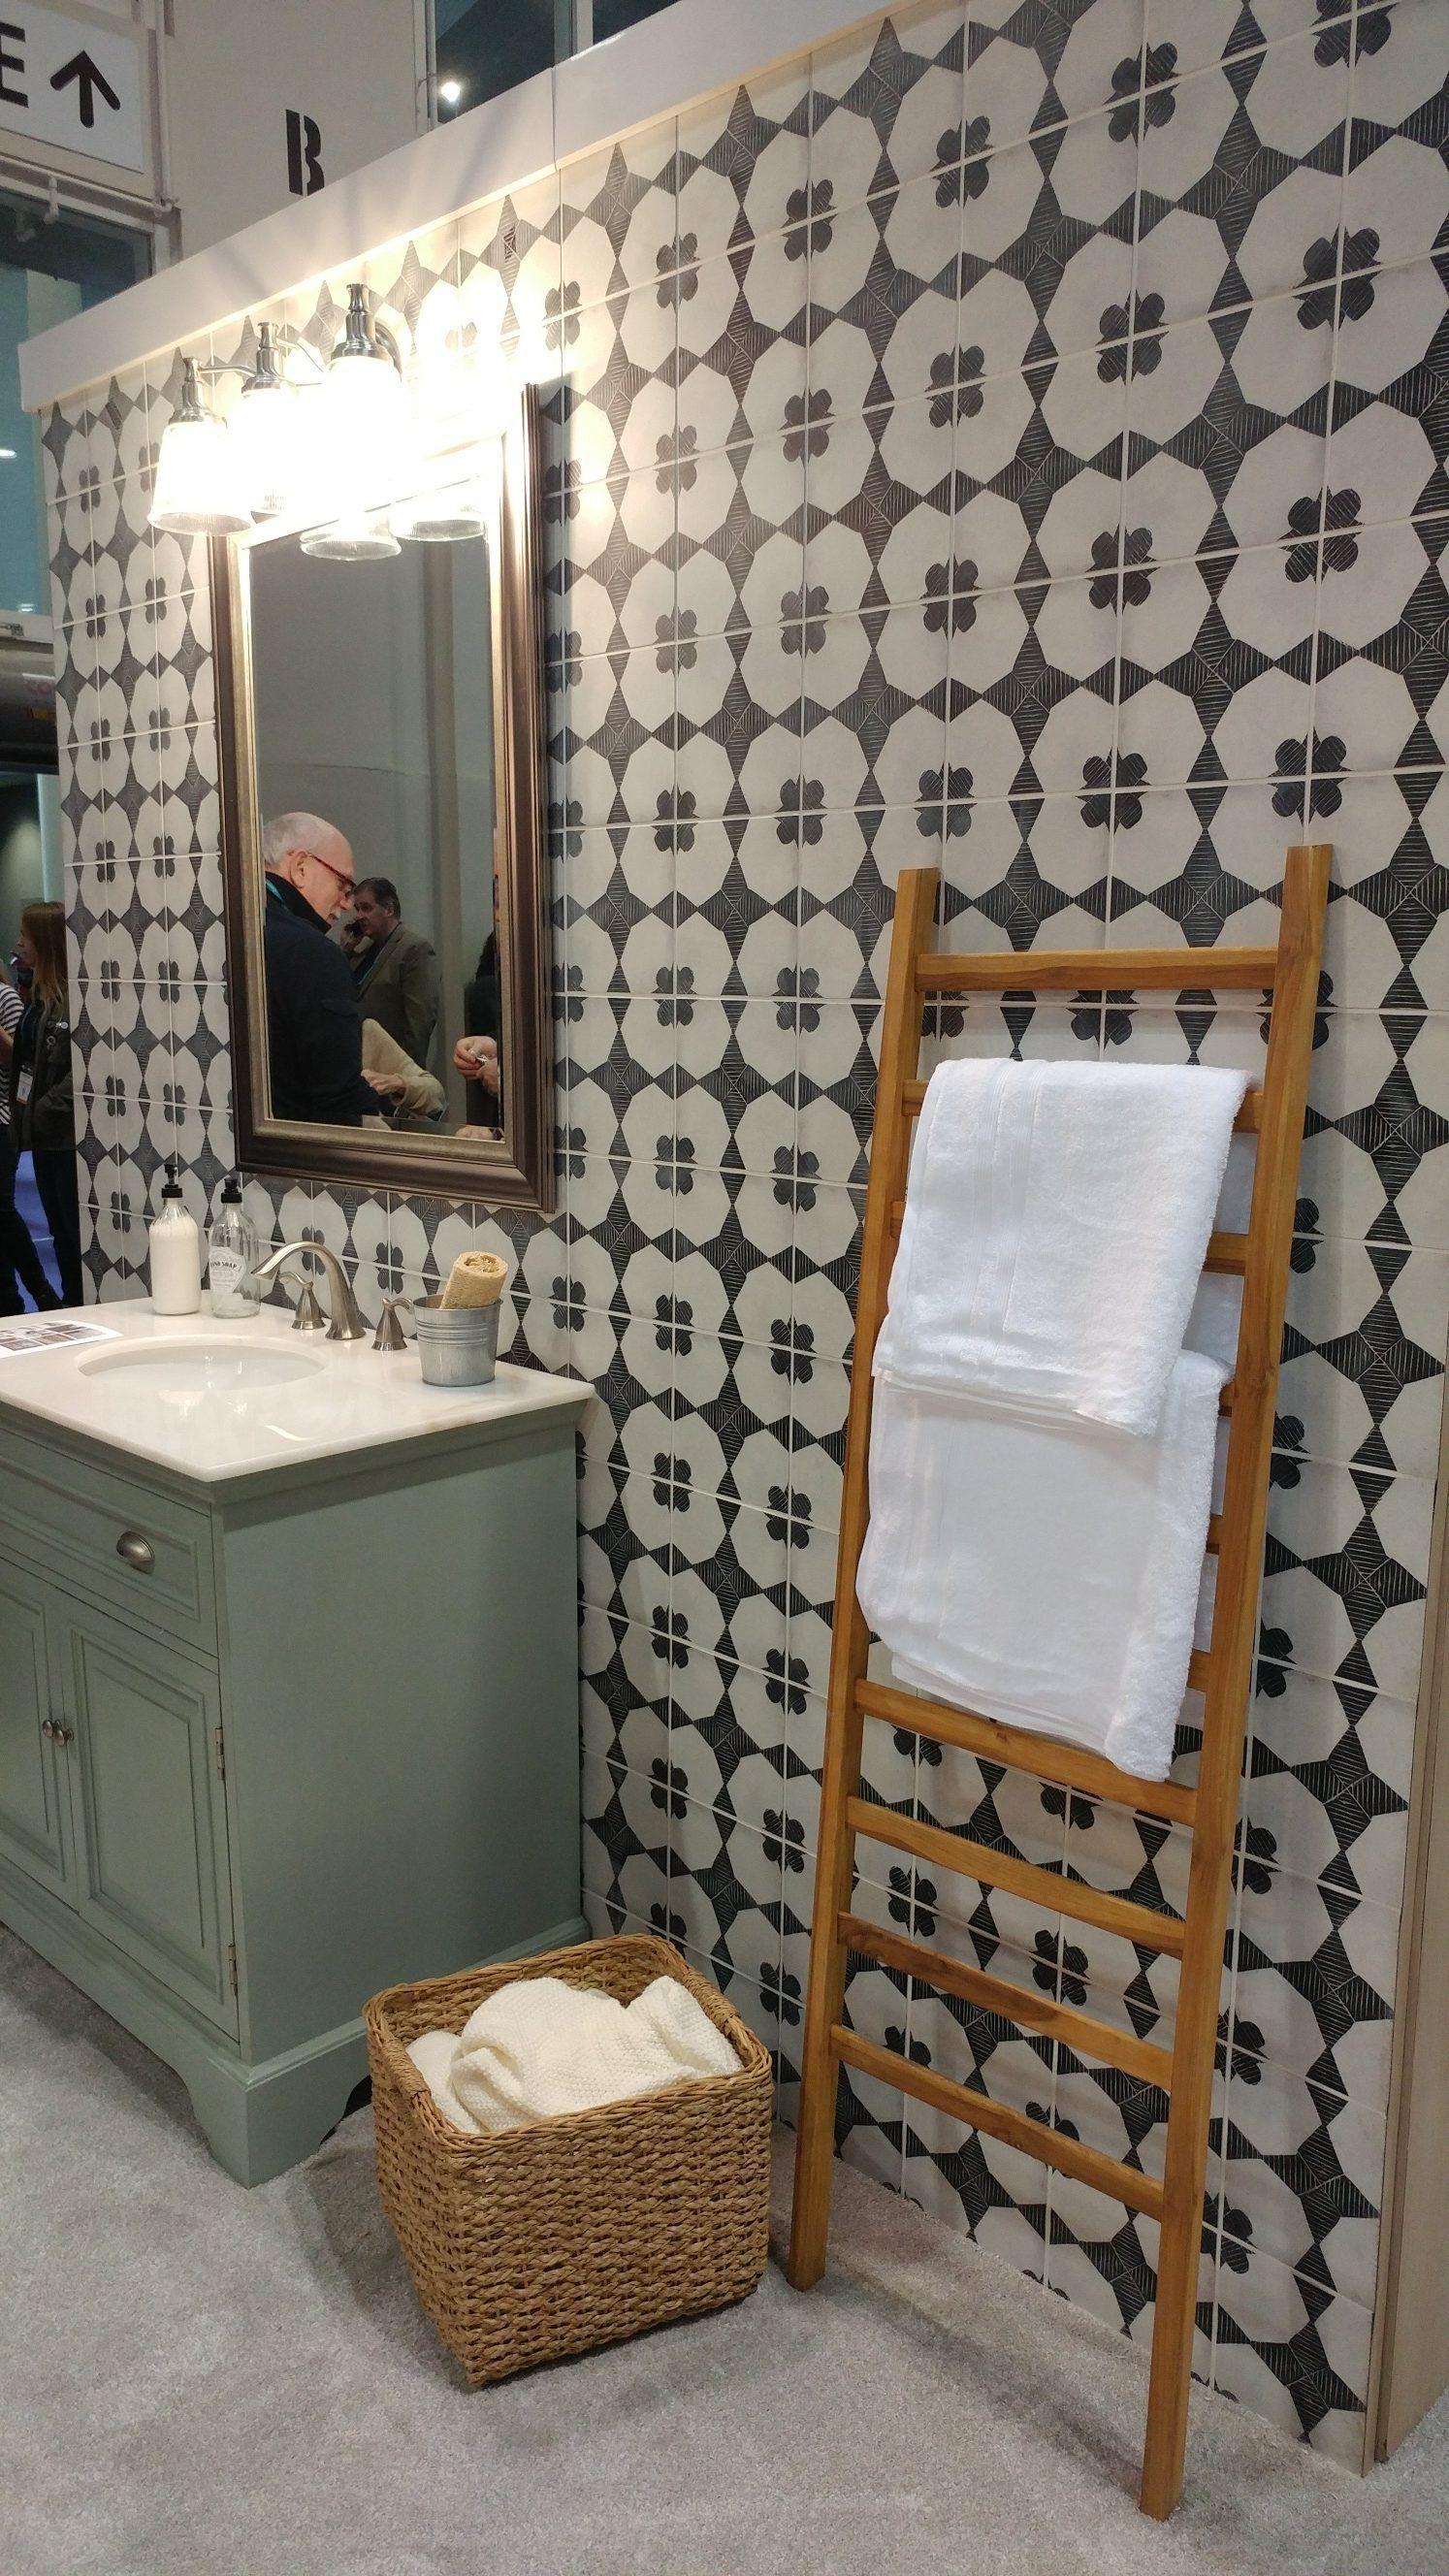 8 Kitchen and Bath Trends You Will Love in 2018 - Harrisburg Kitchen ...